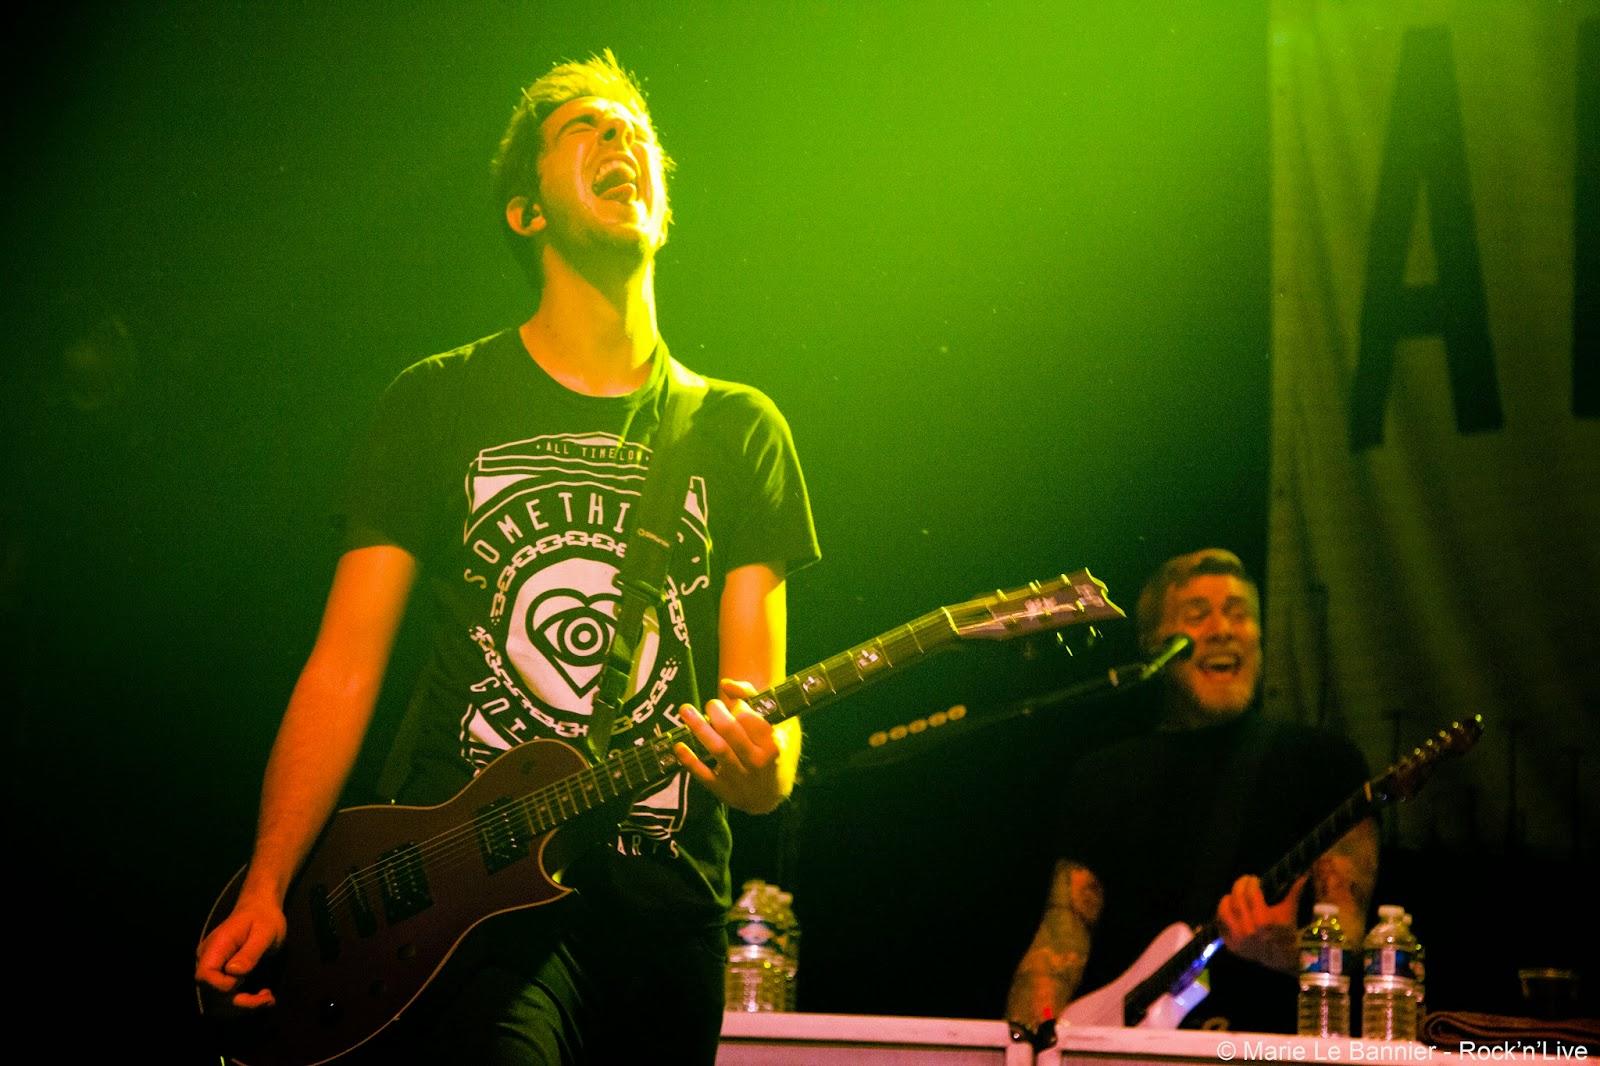 All Time Low Alex Gaskarth Jack Barakat Future Hearts Bataclan Paris Rock Pop Punk Rock'n'Live Marie Le Bannier Concert Live Report